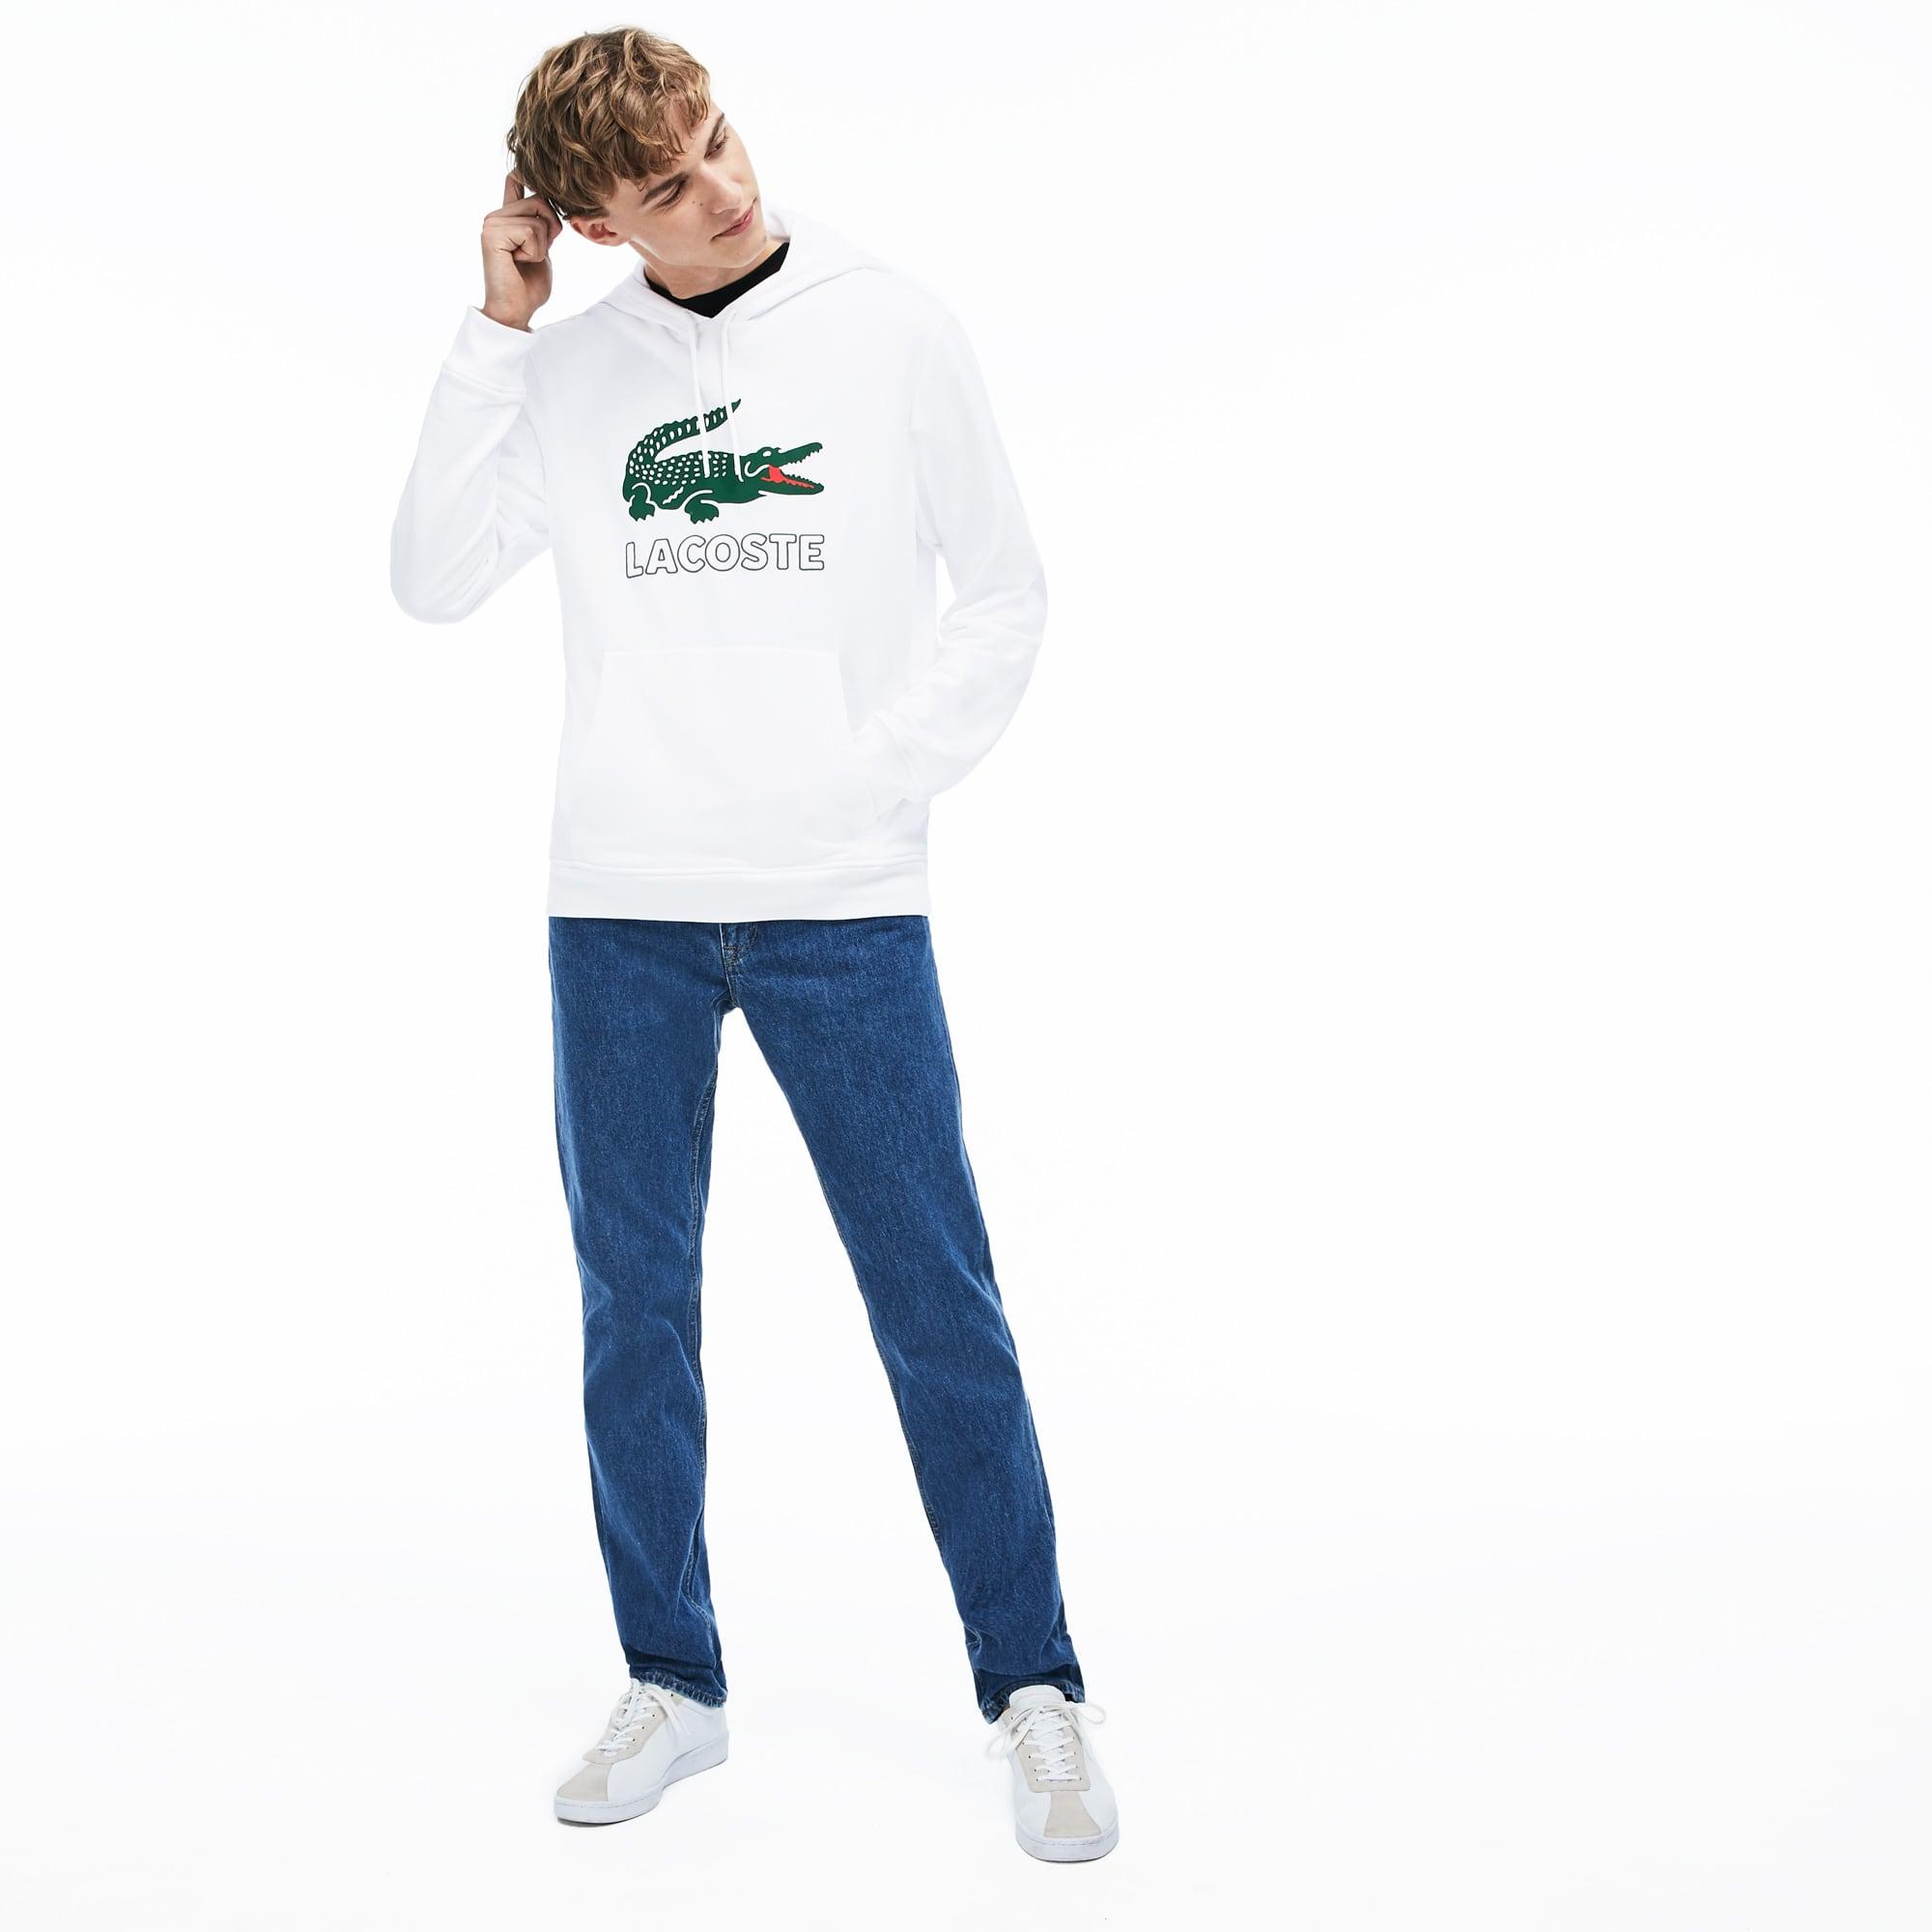 c4f4a10b114 Men s Sweatshirts